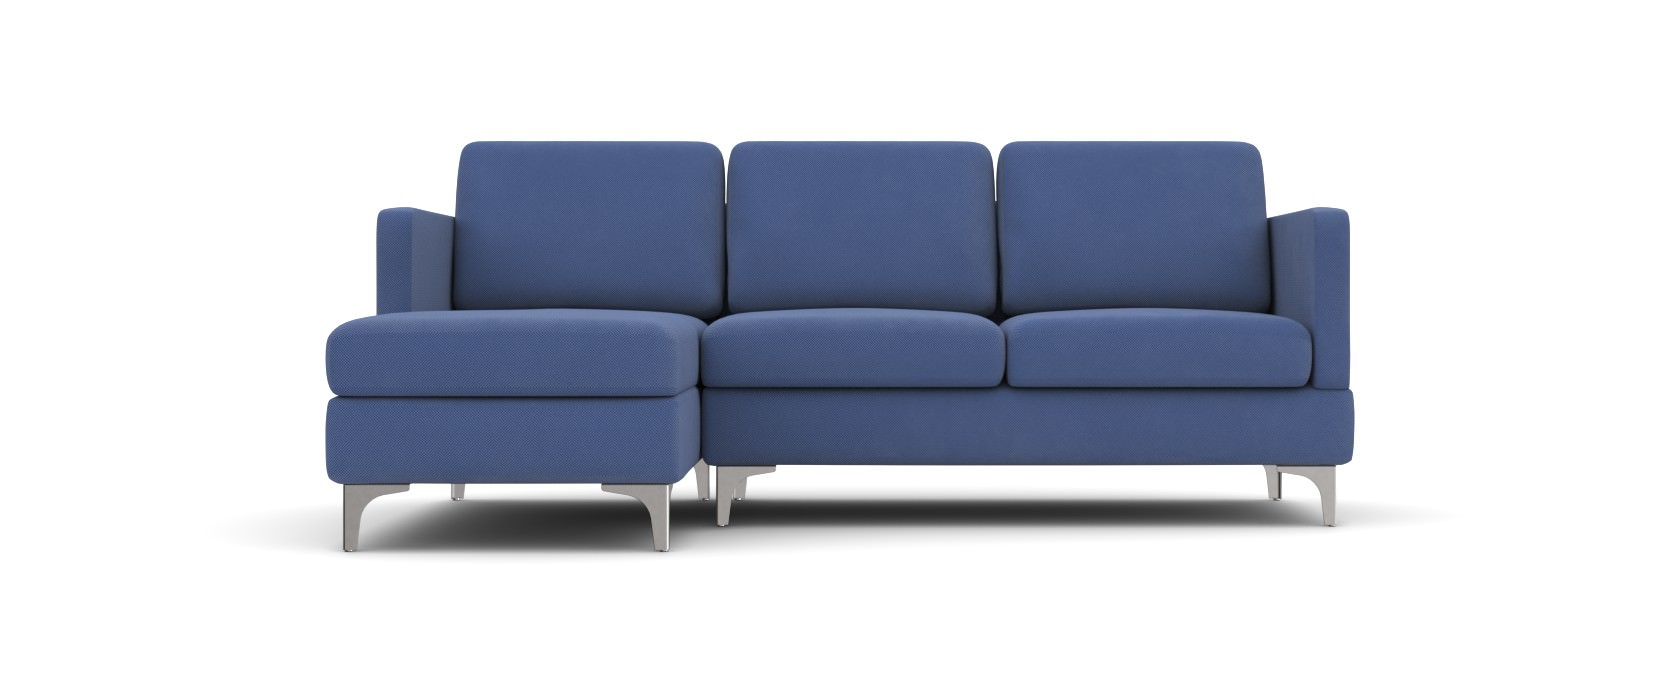 Sofa mit Chaiselongue Manfredo Club